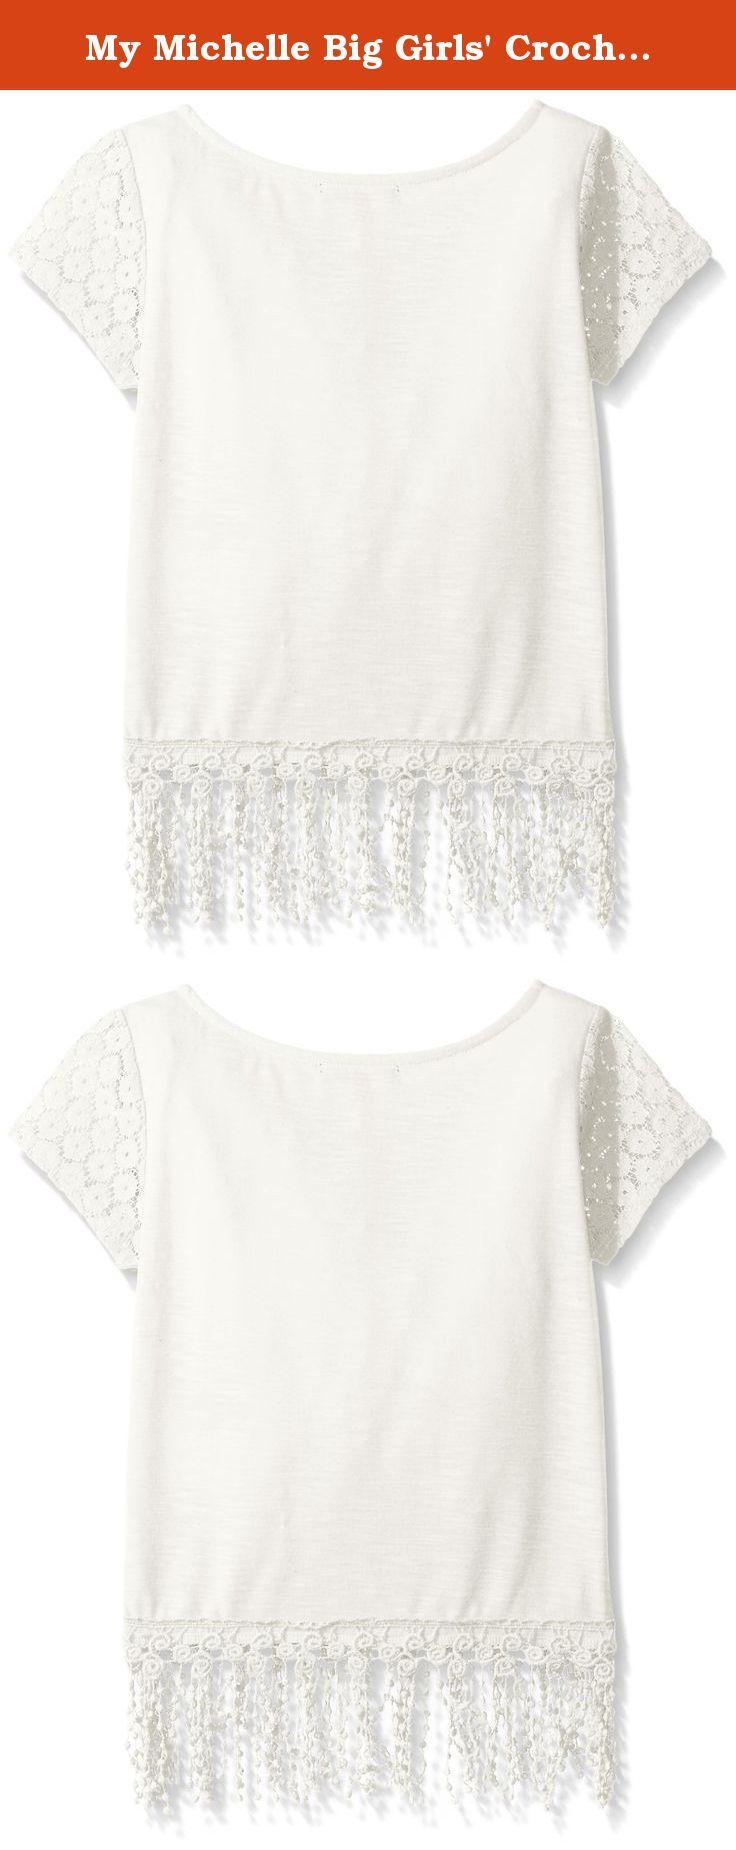 My Michelle Big Girls' Crochet Short Sleeve Top with Fringe Trim At Hem, Off White, X-Large. Solid colored crochet short sleeve top with fringe trim at hem.